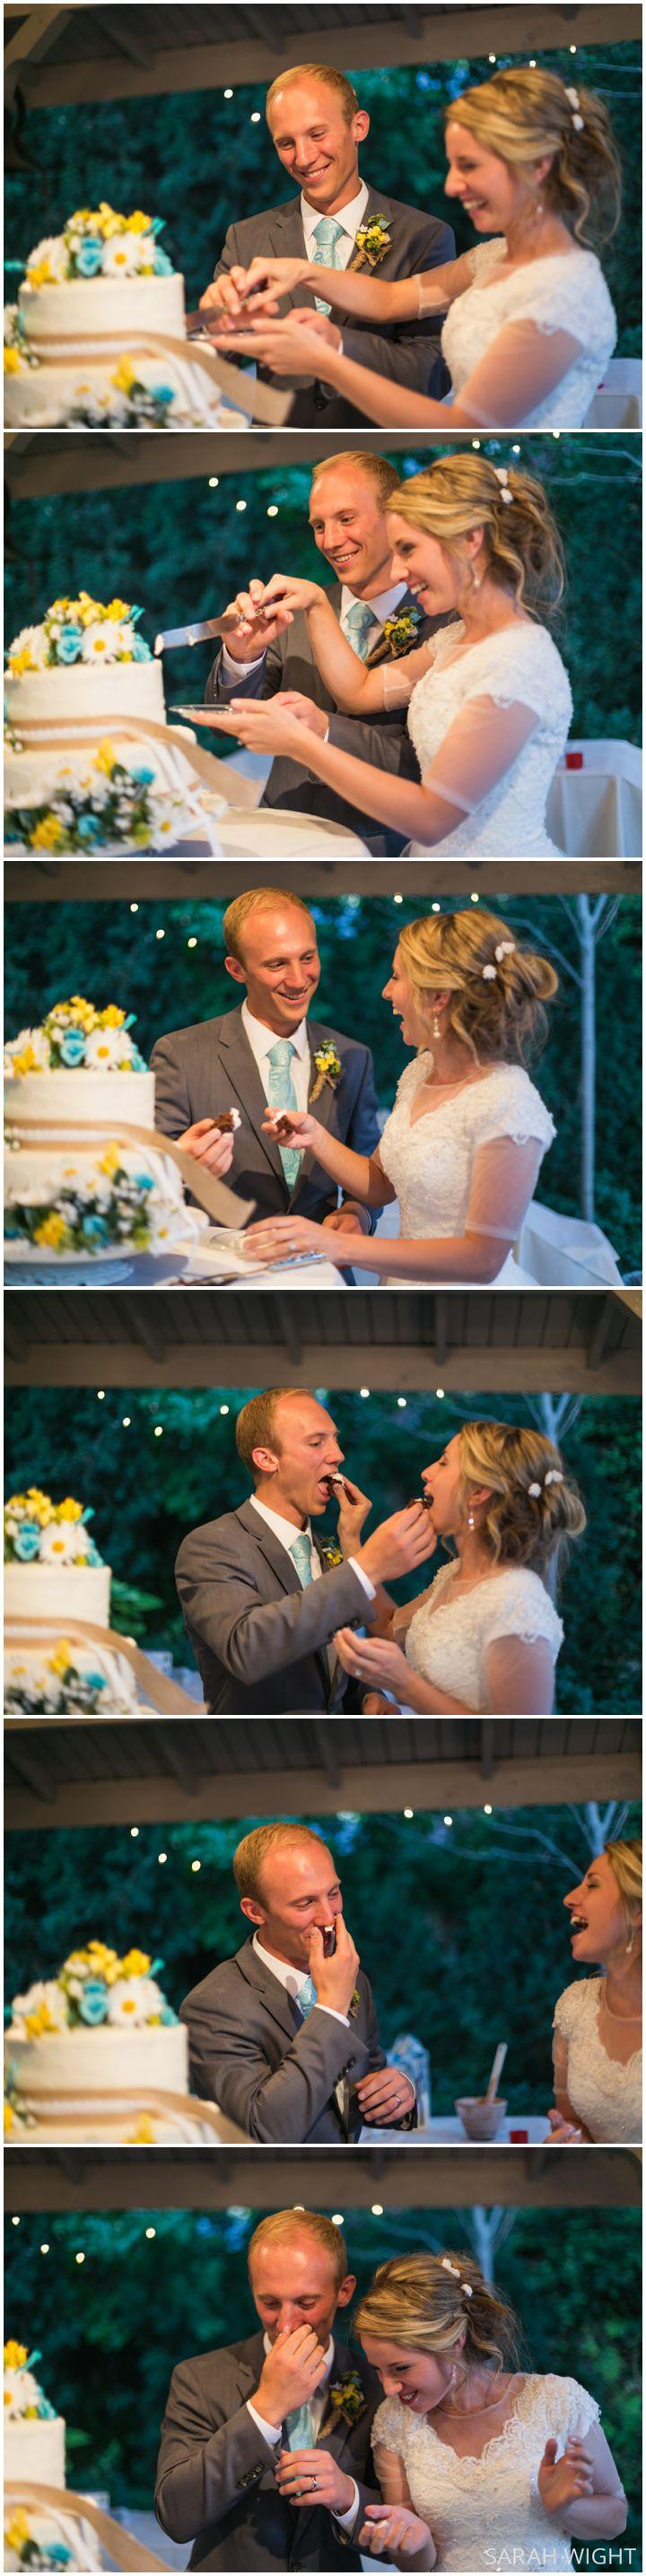 Utah Wedding Bungalow Draper Photographer-80.jpg